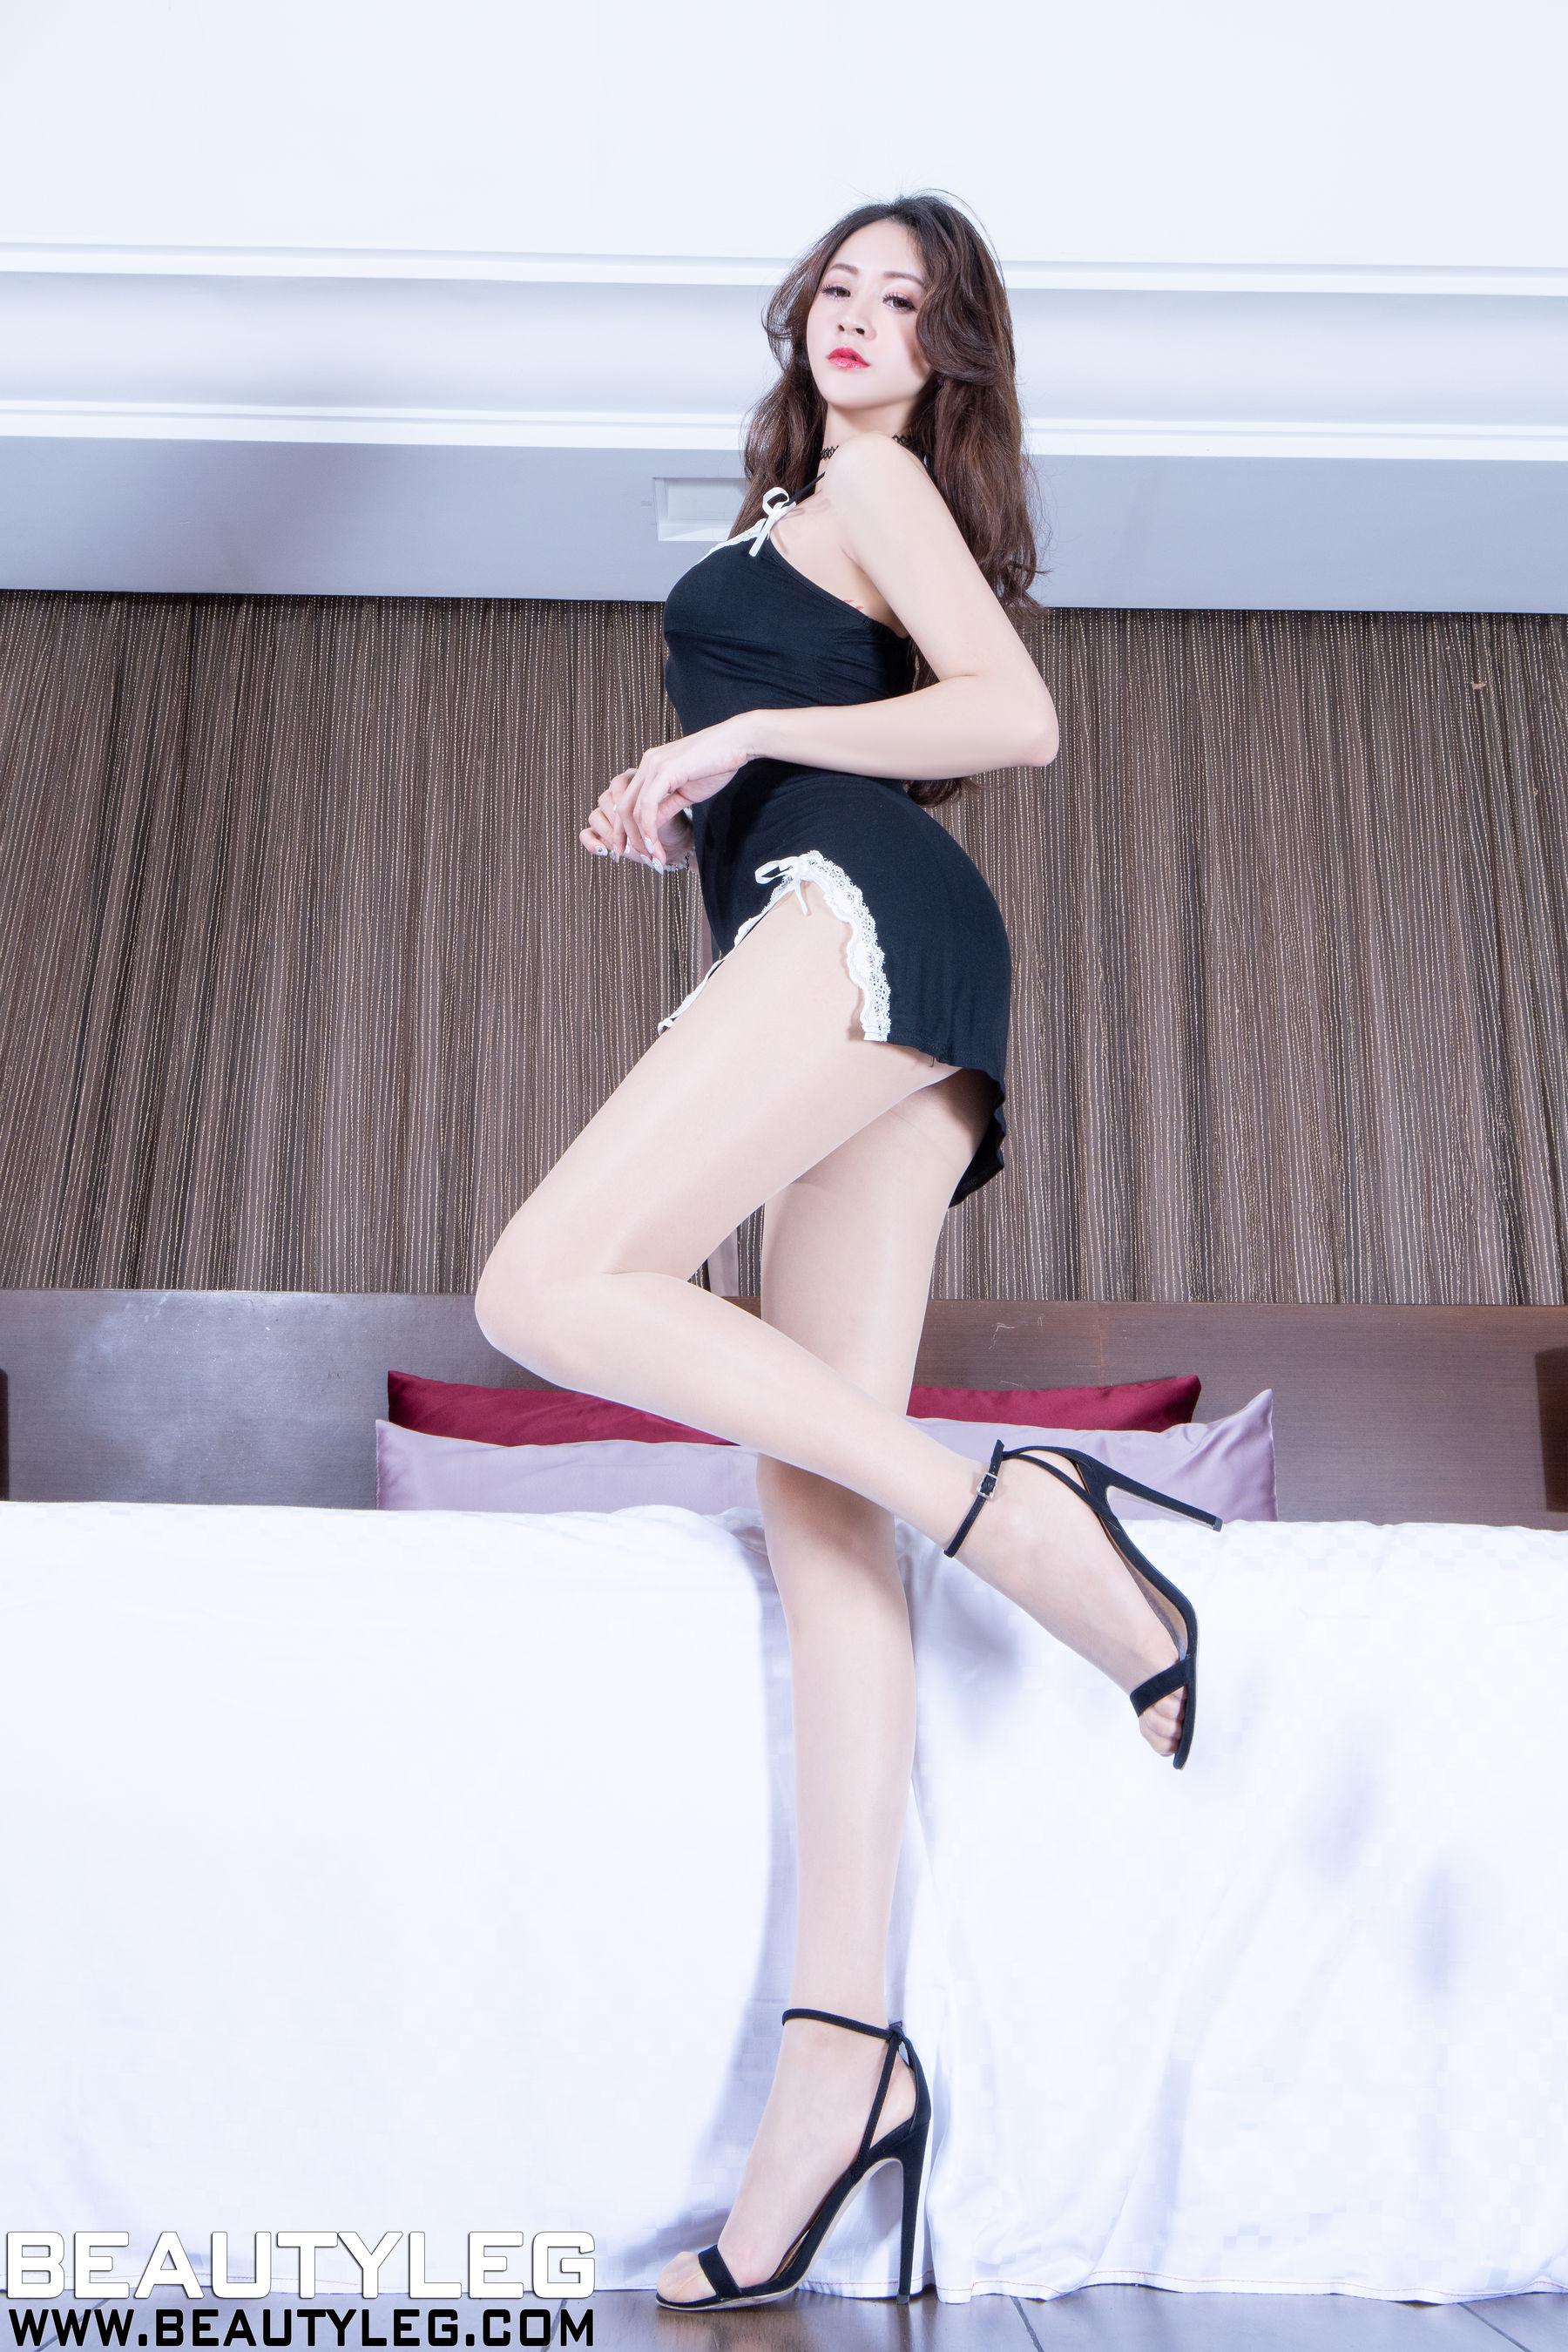 VOL.143 [Beautyleg]轻熟女肉丝美腿:Lola雪岑(腿模Lola)超高清个人性感漂亮大图(48P)